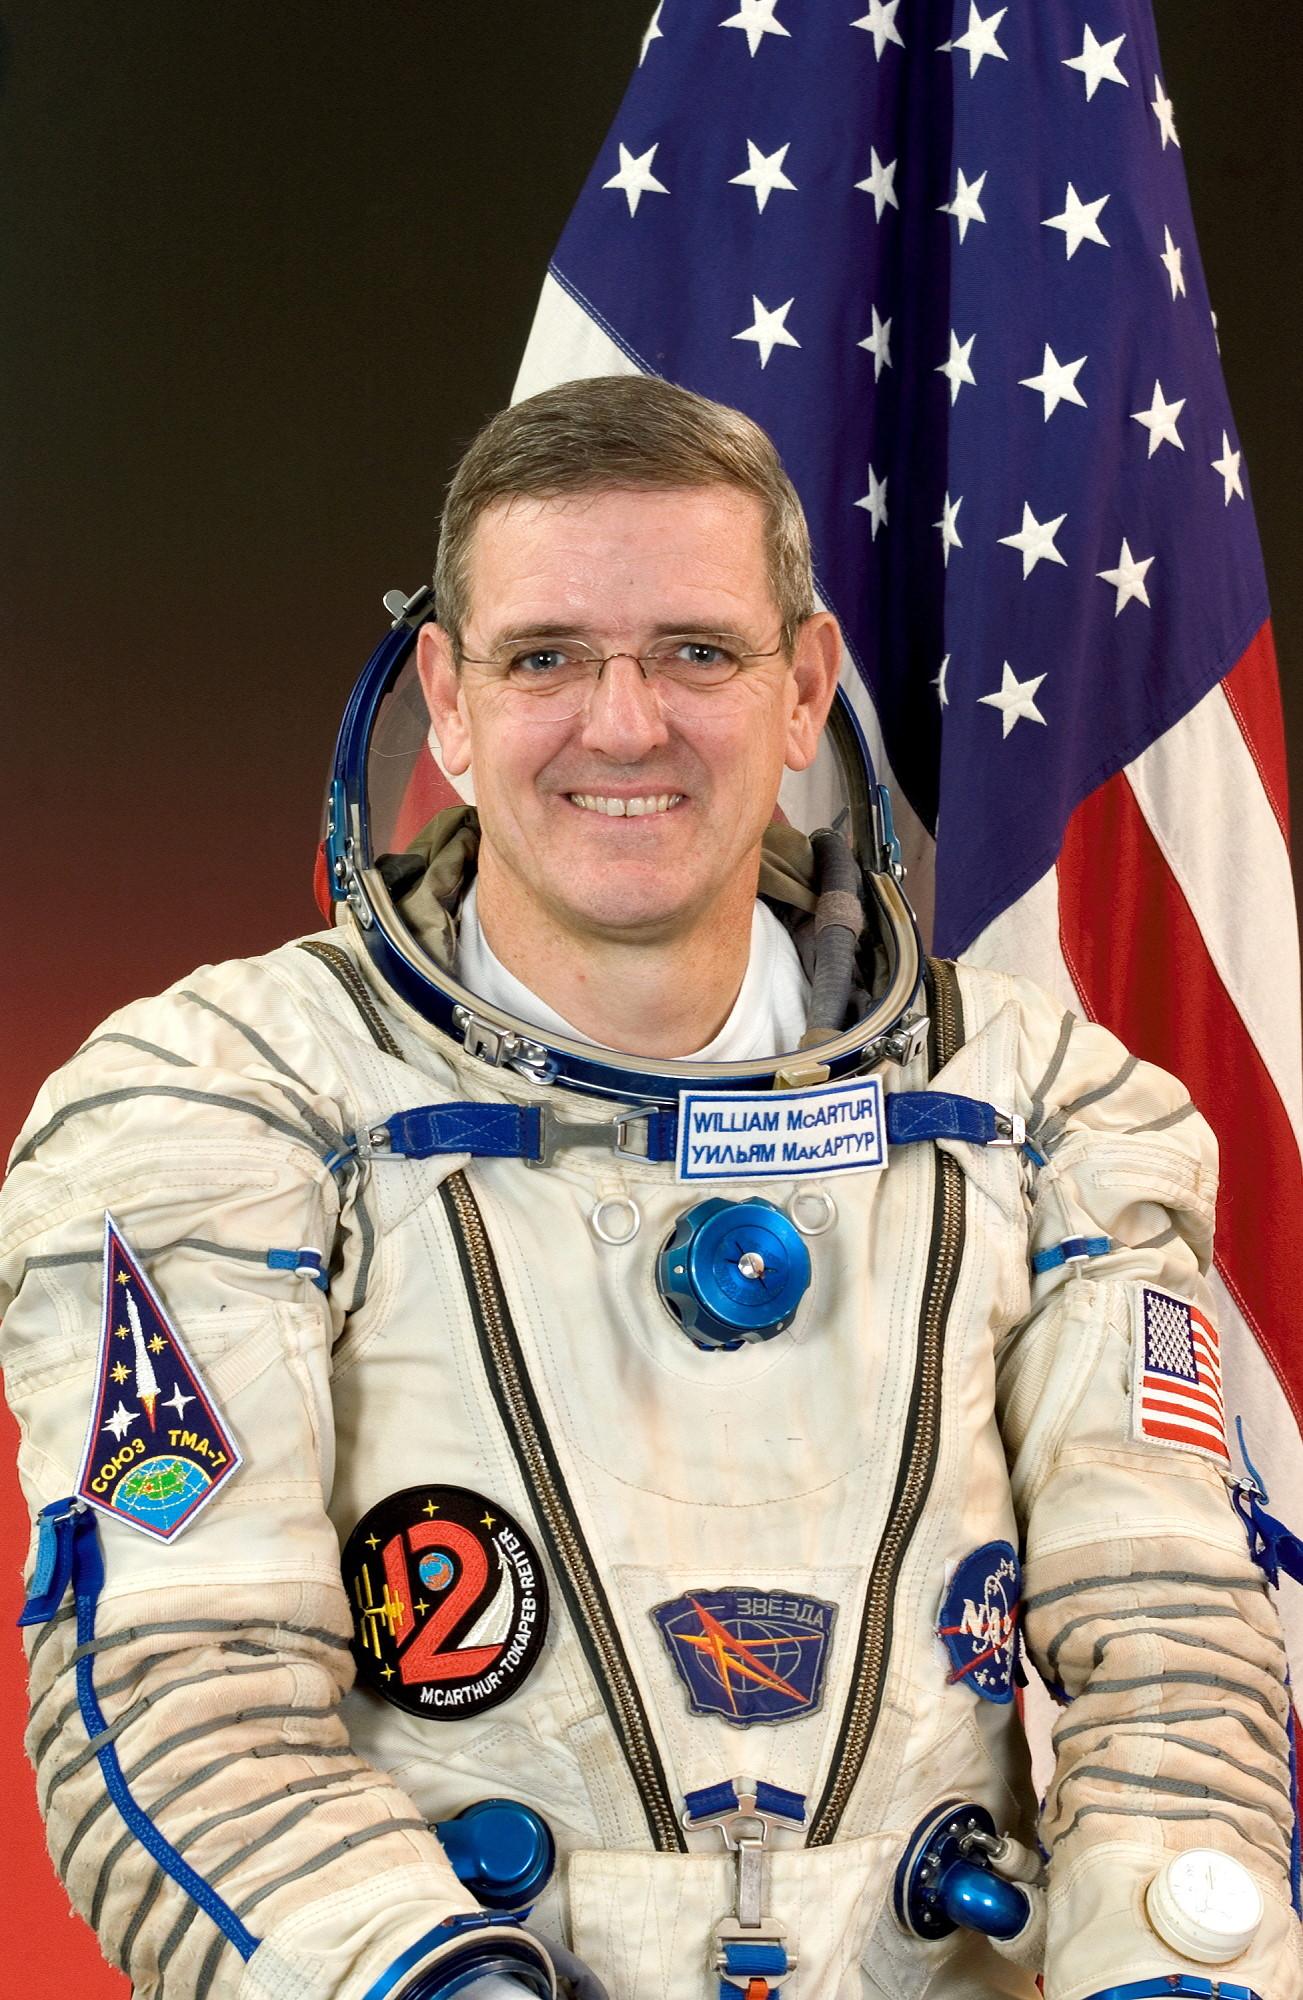 Astronaut Biography: William McArthur